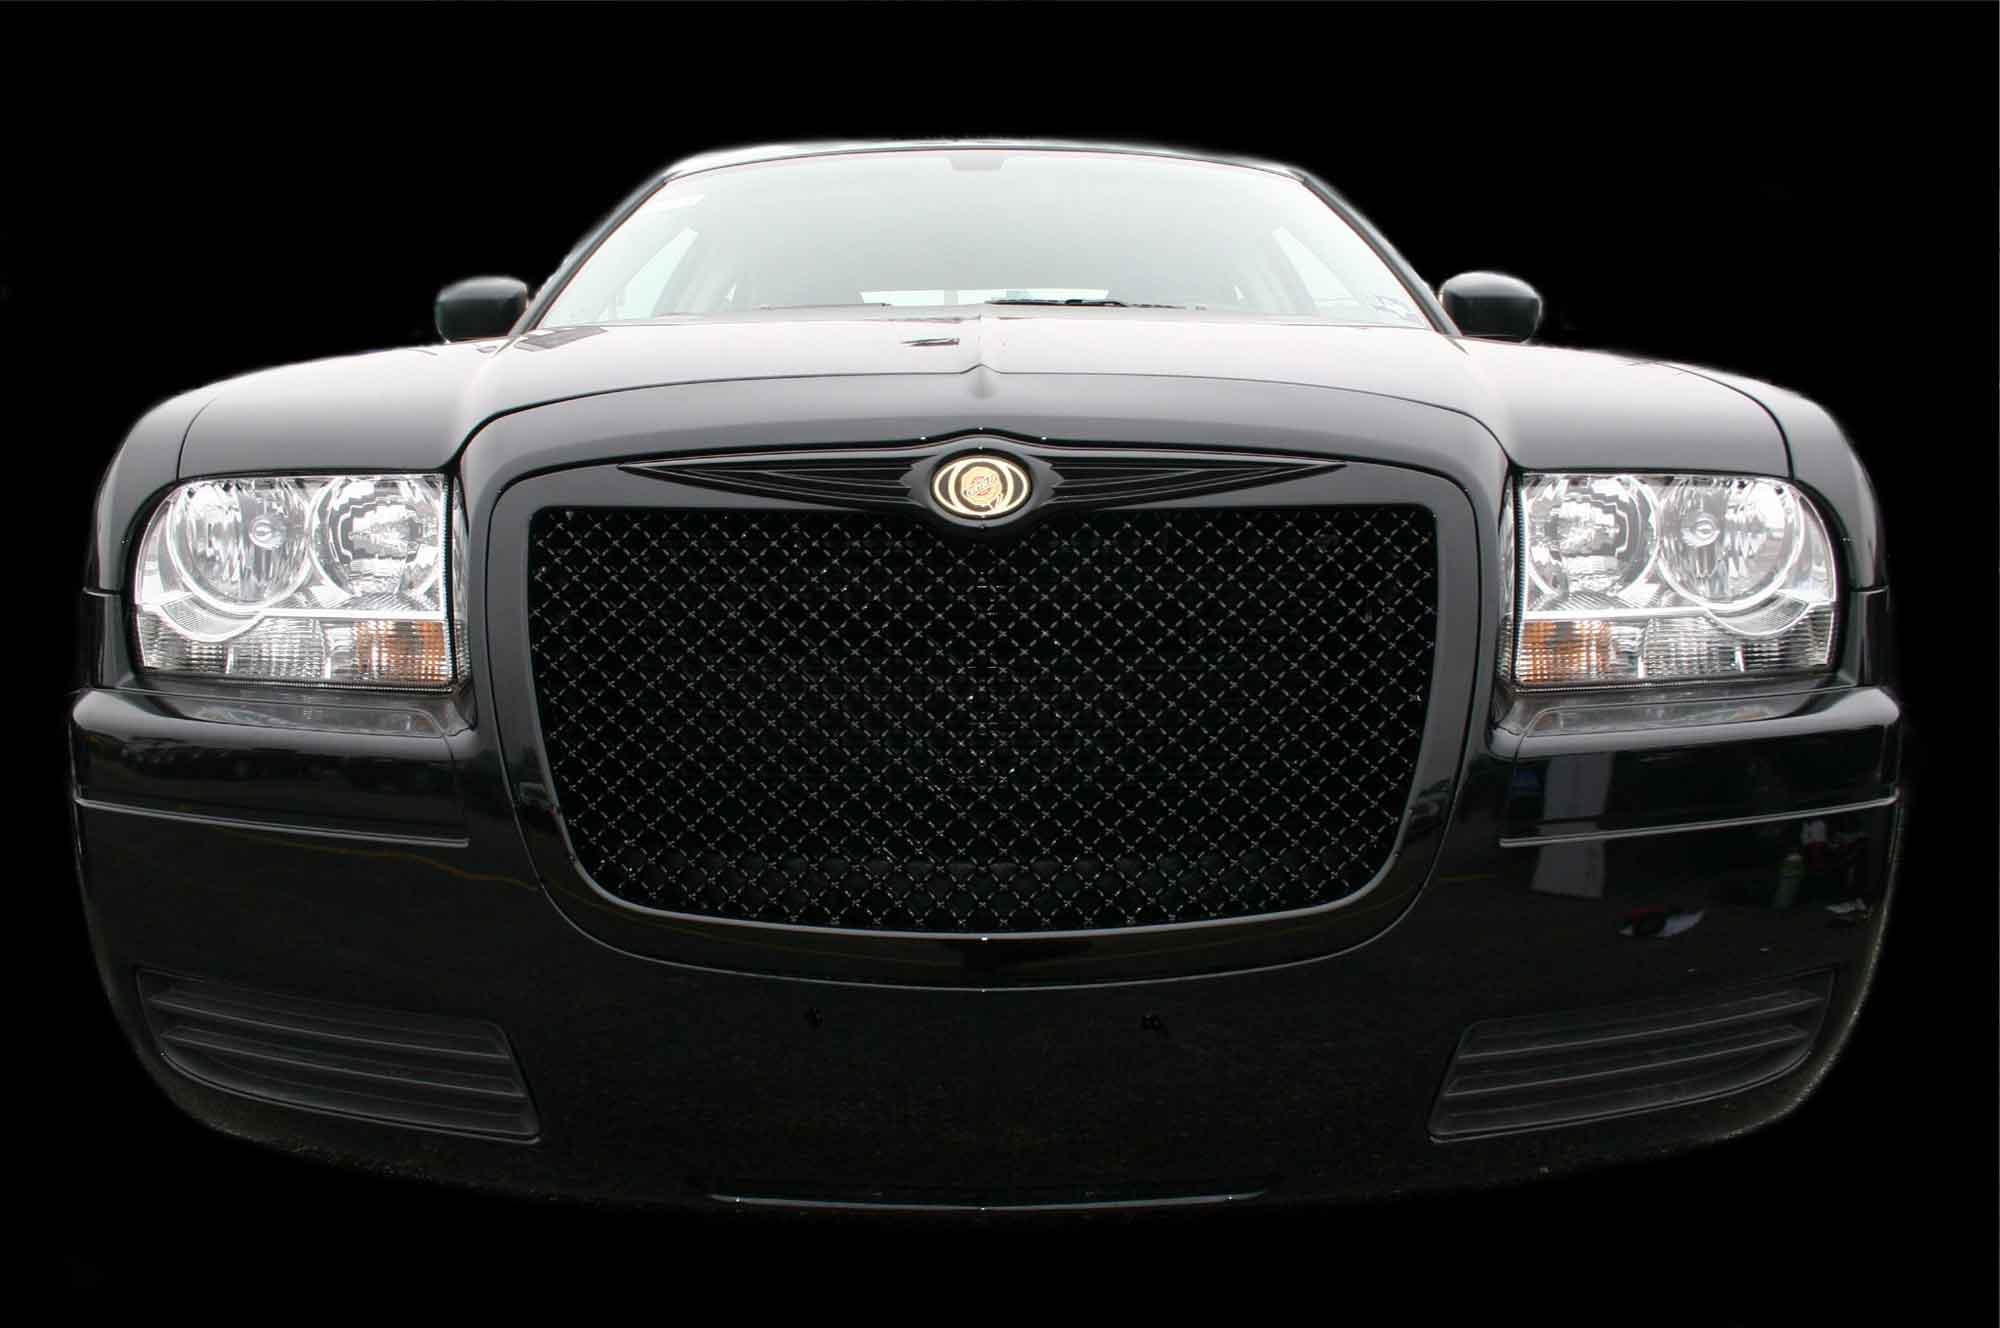 Chrysler 300 black bentley mesh grille